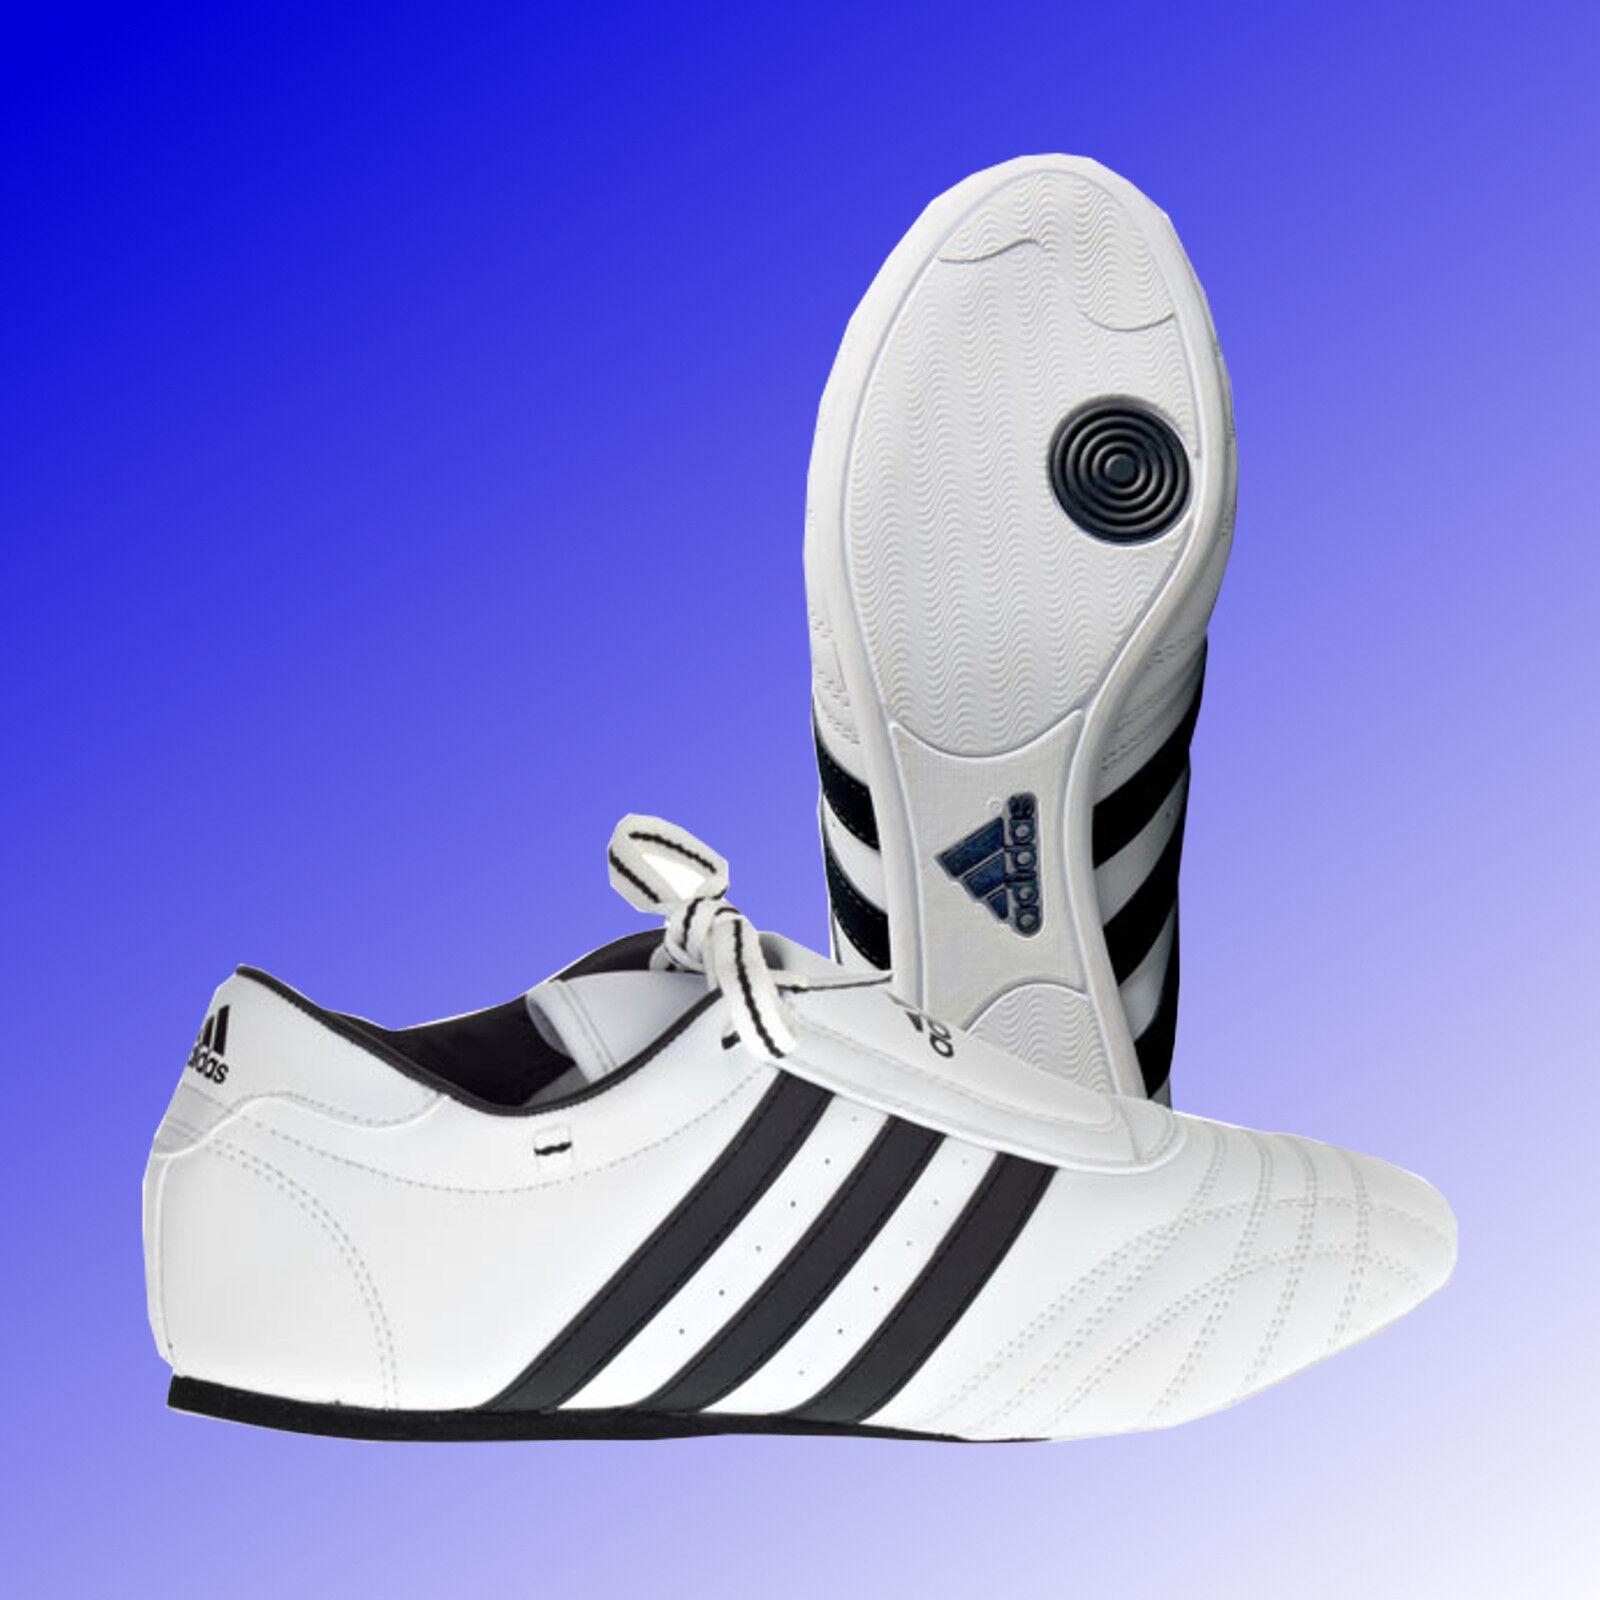 Adidas® SM II Taekwondo Slipper TKD Kampfsport Schuhe Sneaker Slipper Taekwondo weiß 36 - 48 de58e7